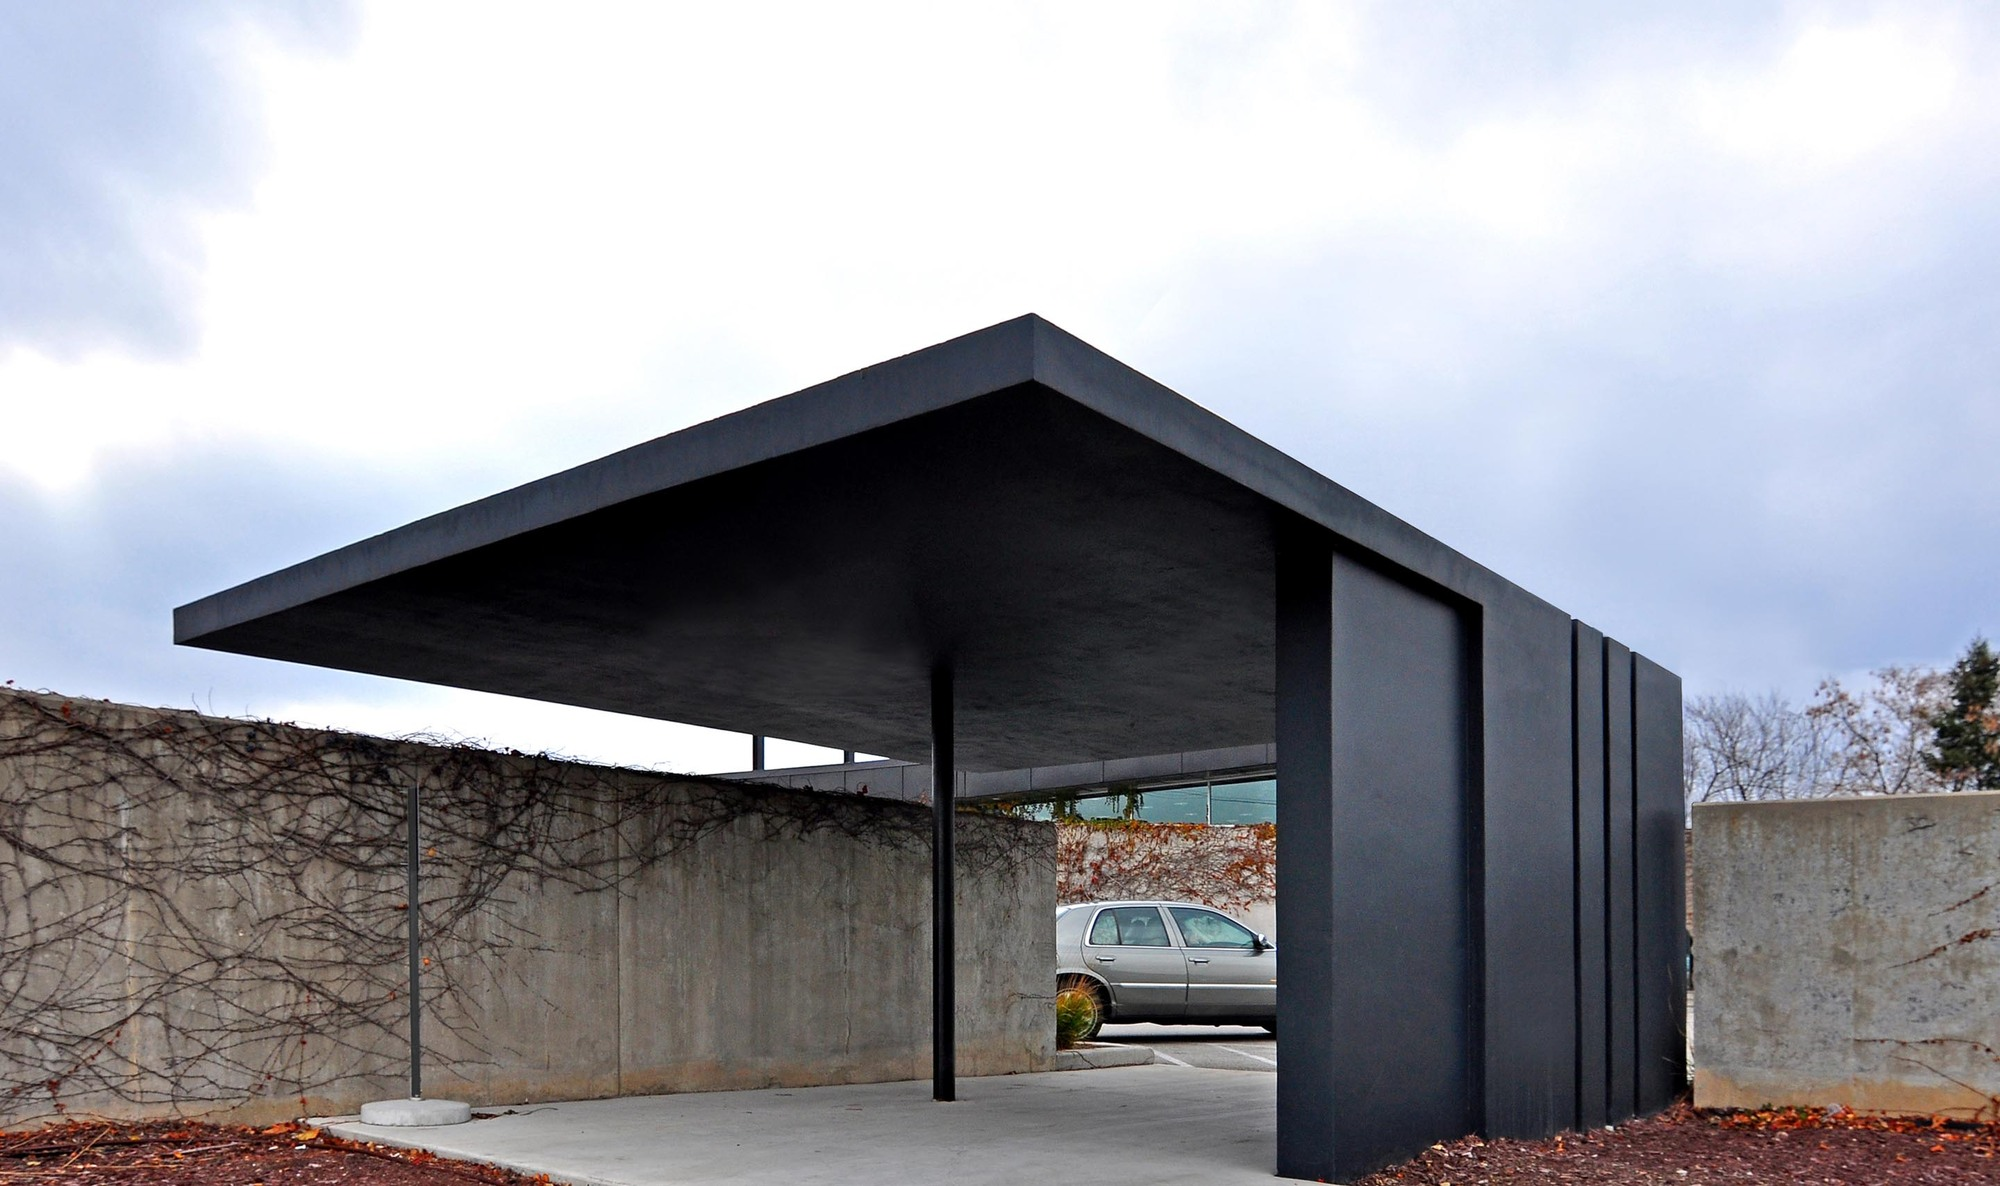 Pavilhão Layton / Johnsen Schmaling Architects, ©  John J. Macaulay